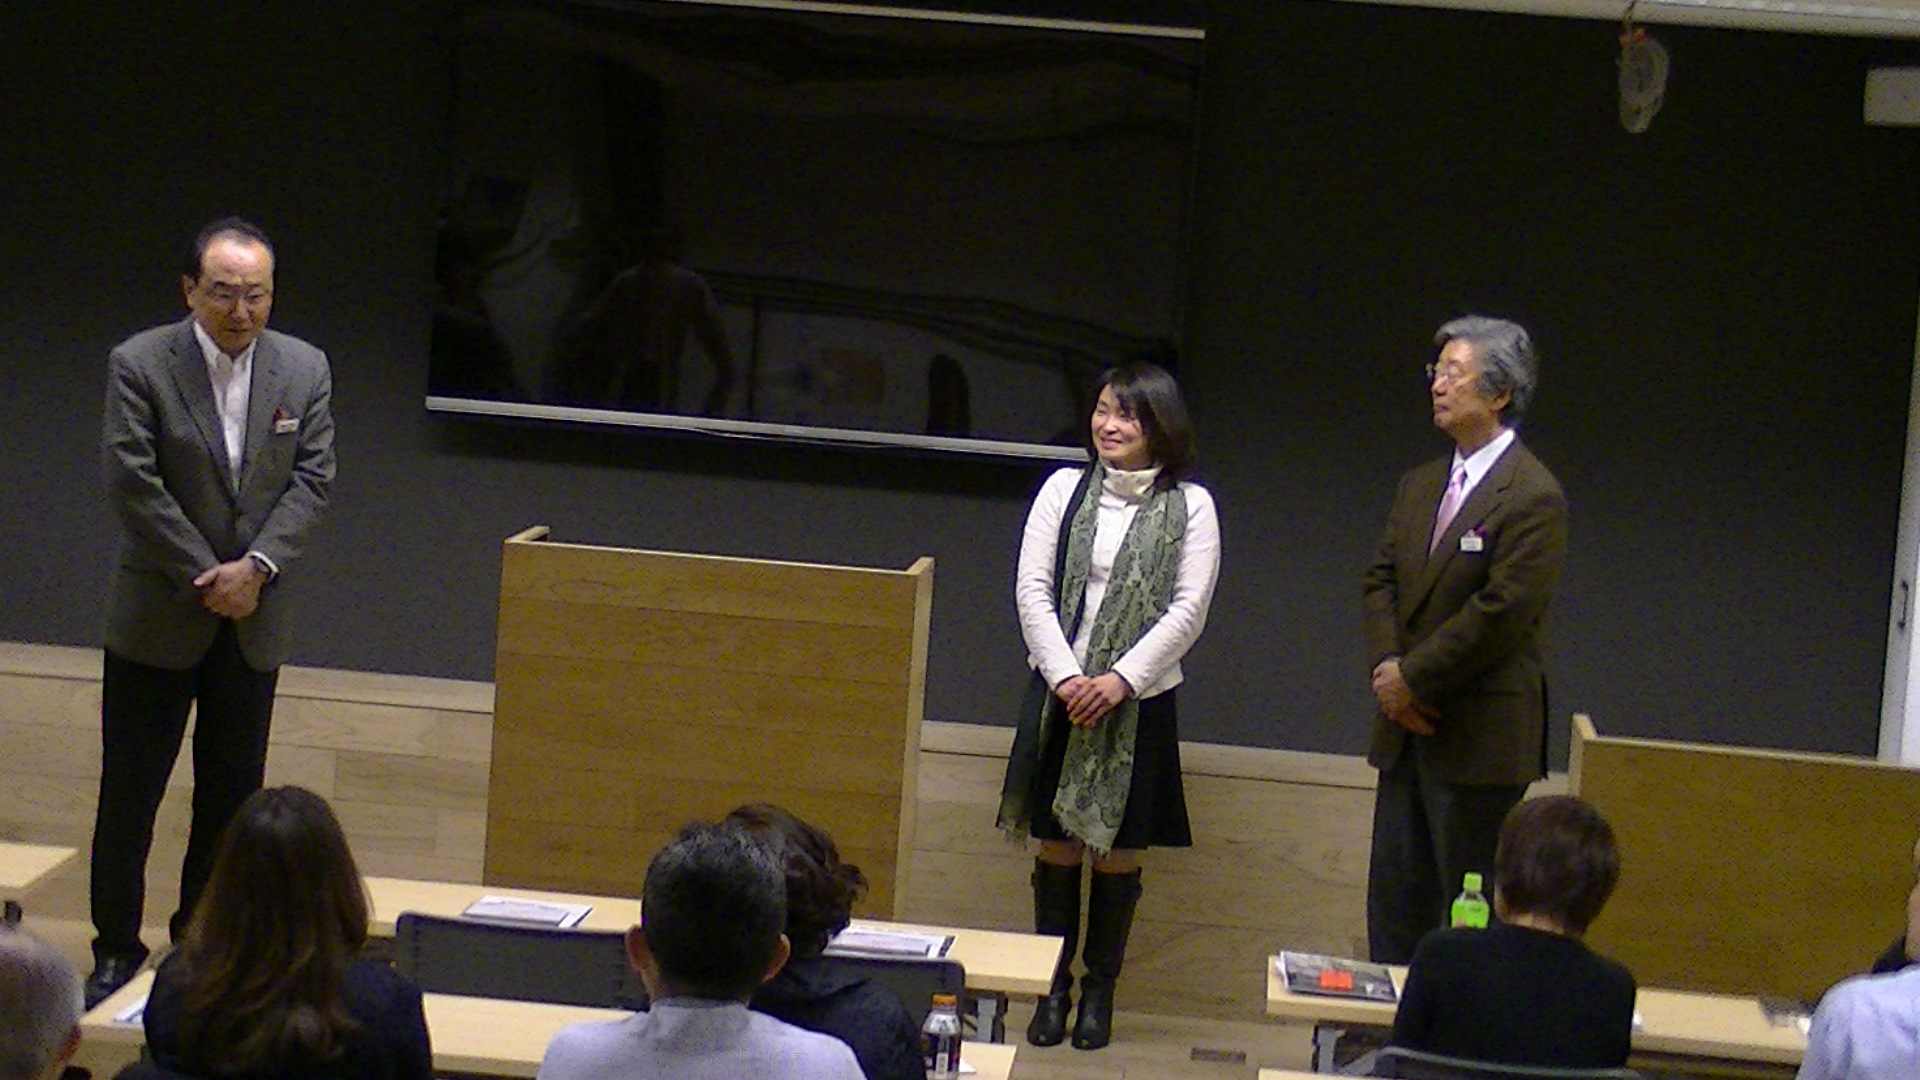 PIC 0536 - 4月1日東京思風塾の開催になります。